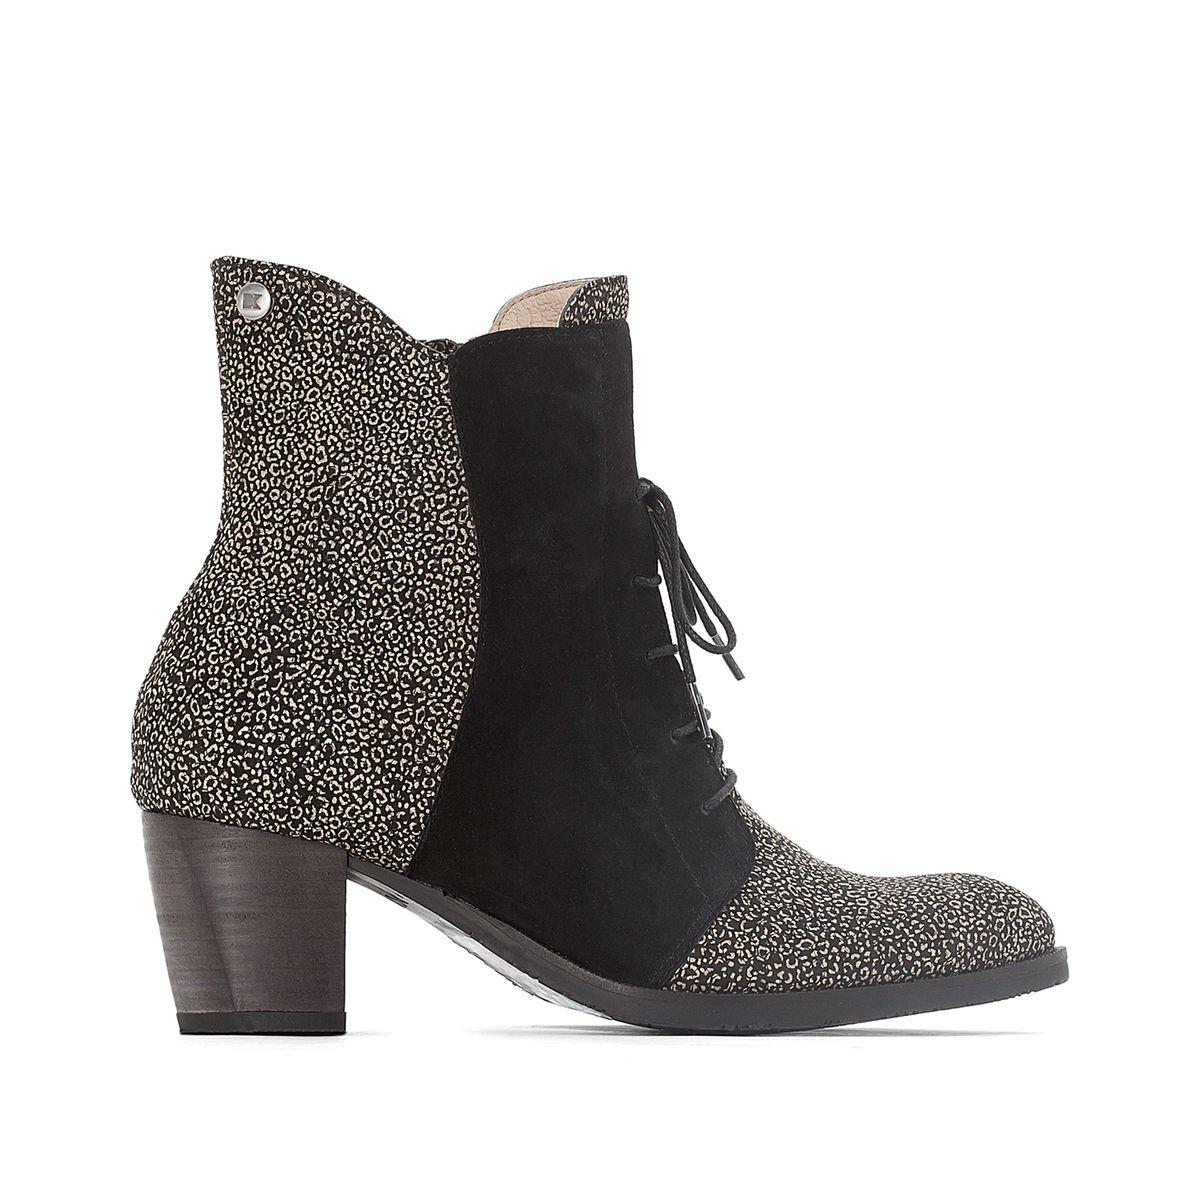 Boots cuir kitten heel